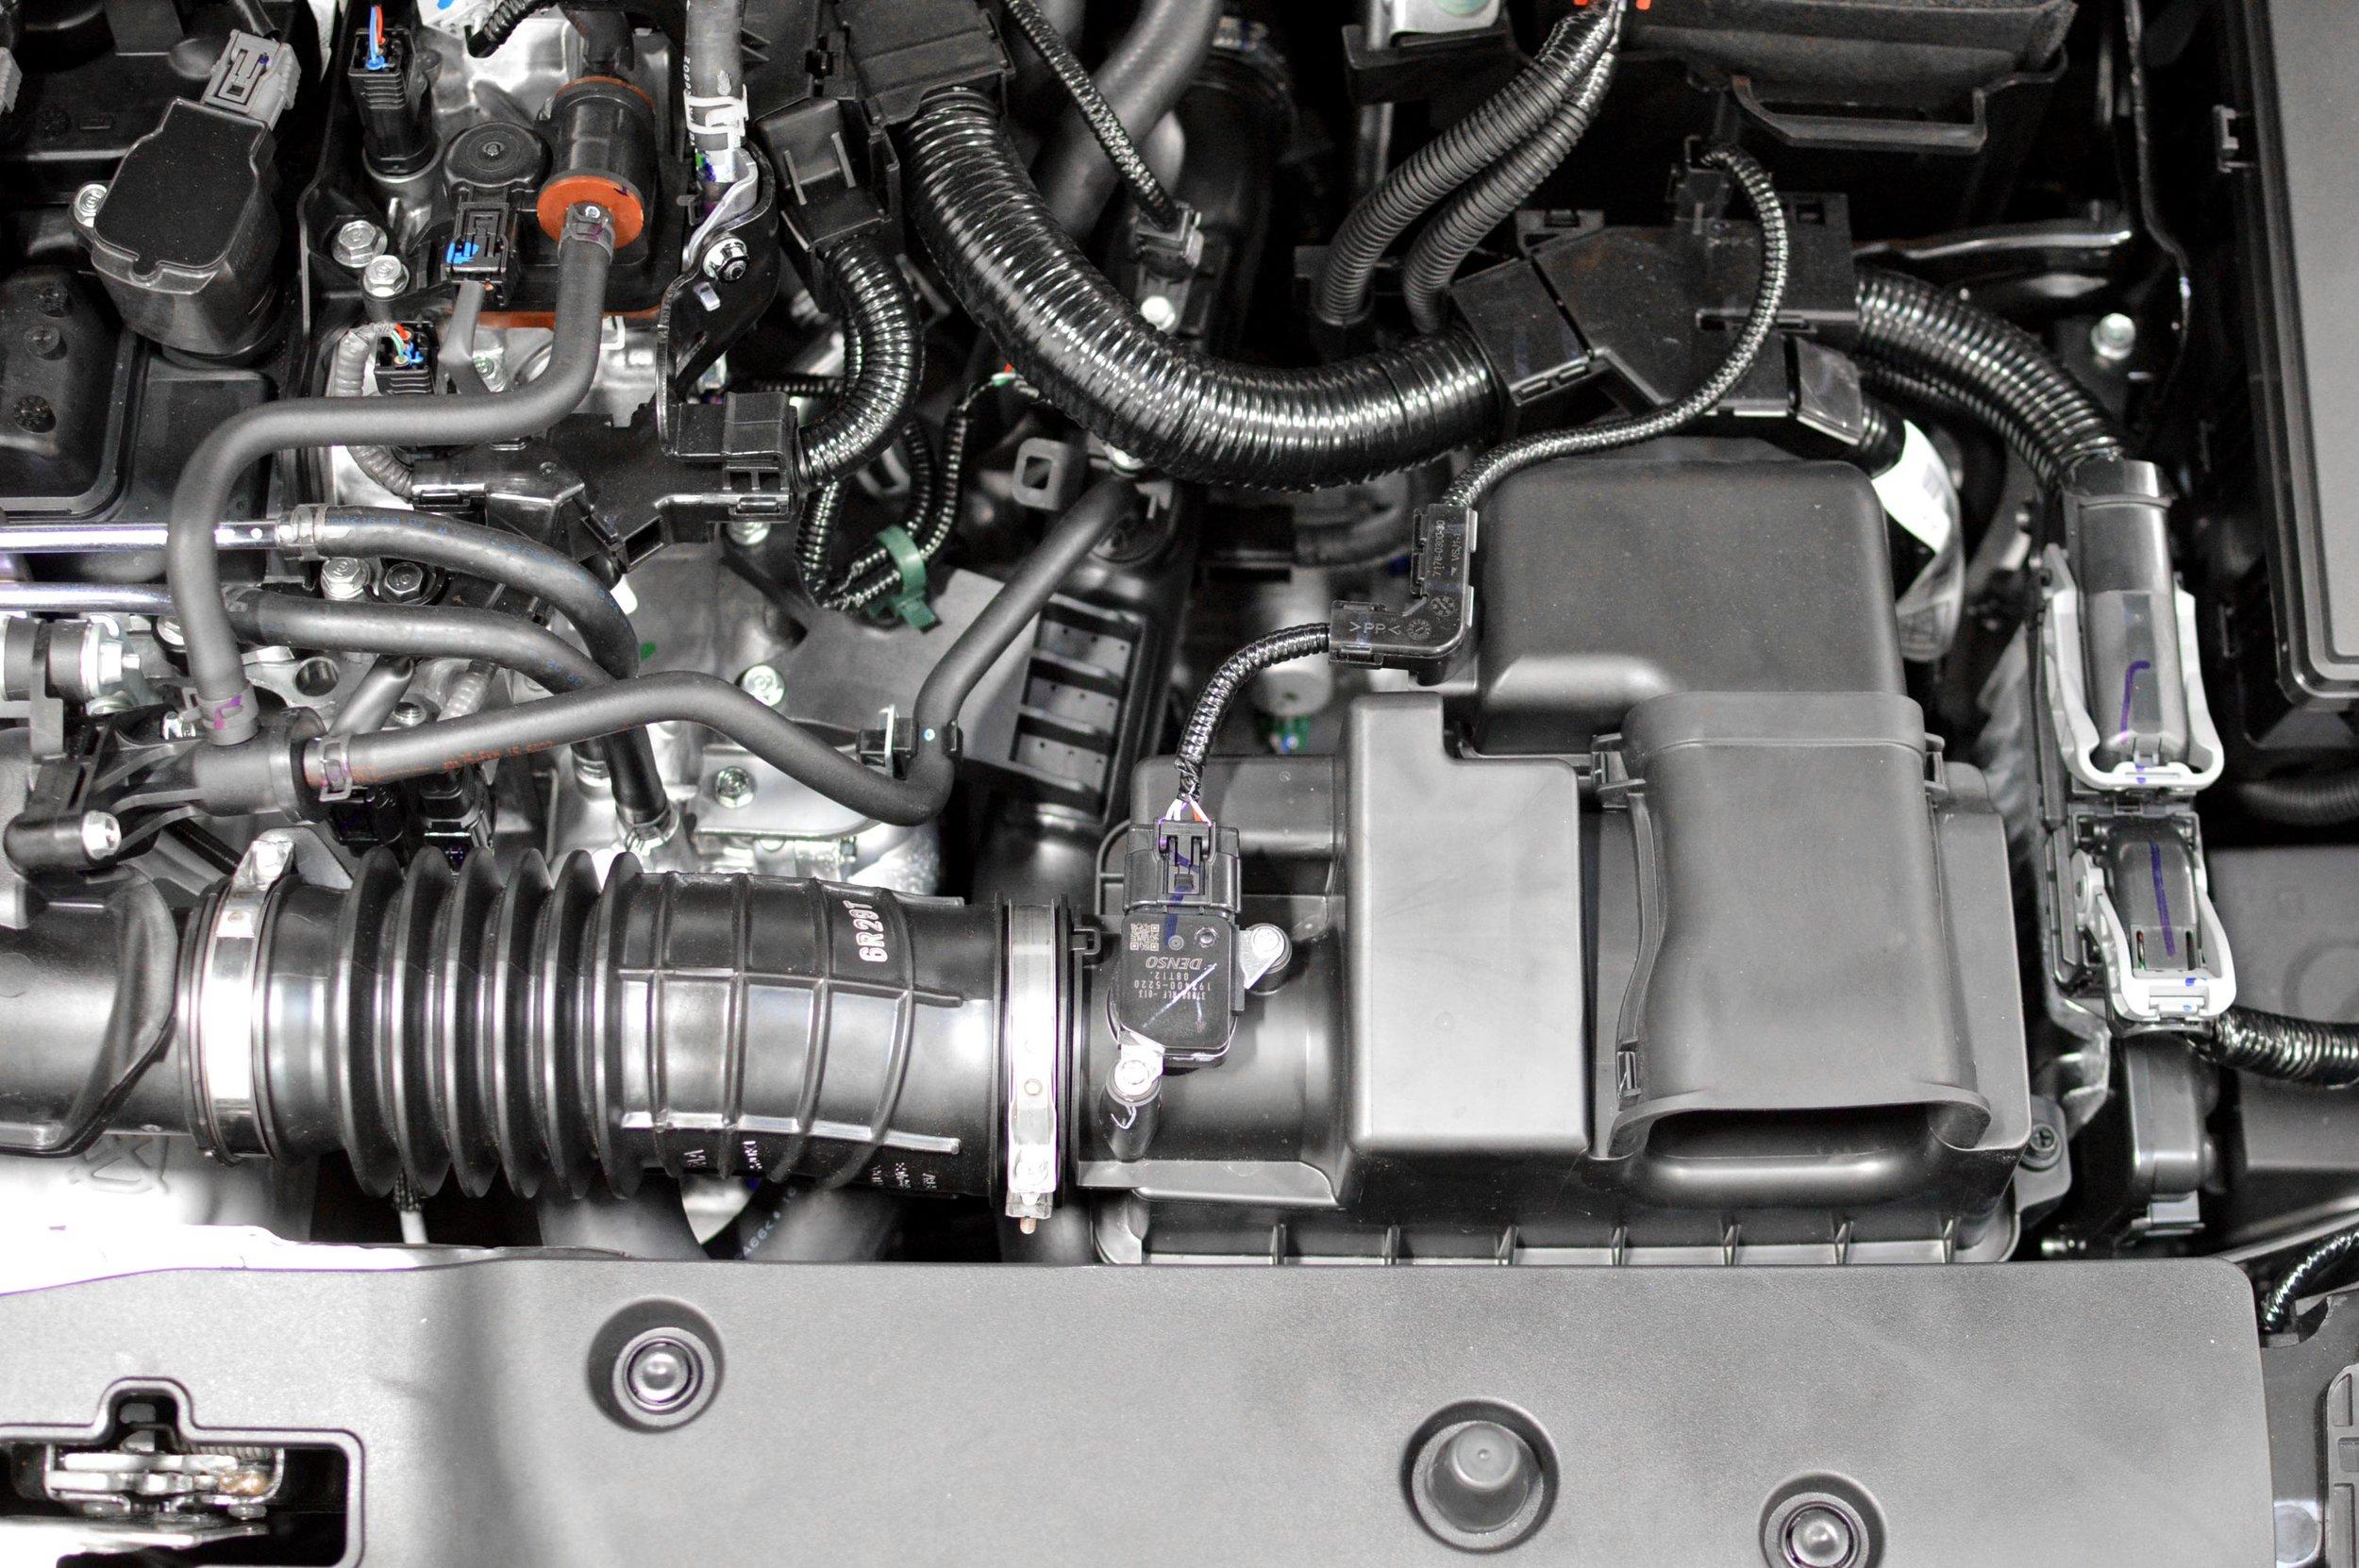 Honda-OE-Engine-Bay-web.jpg